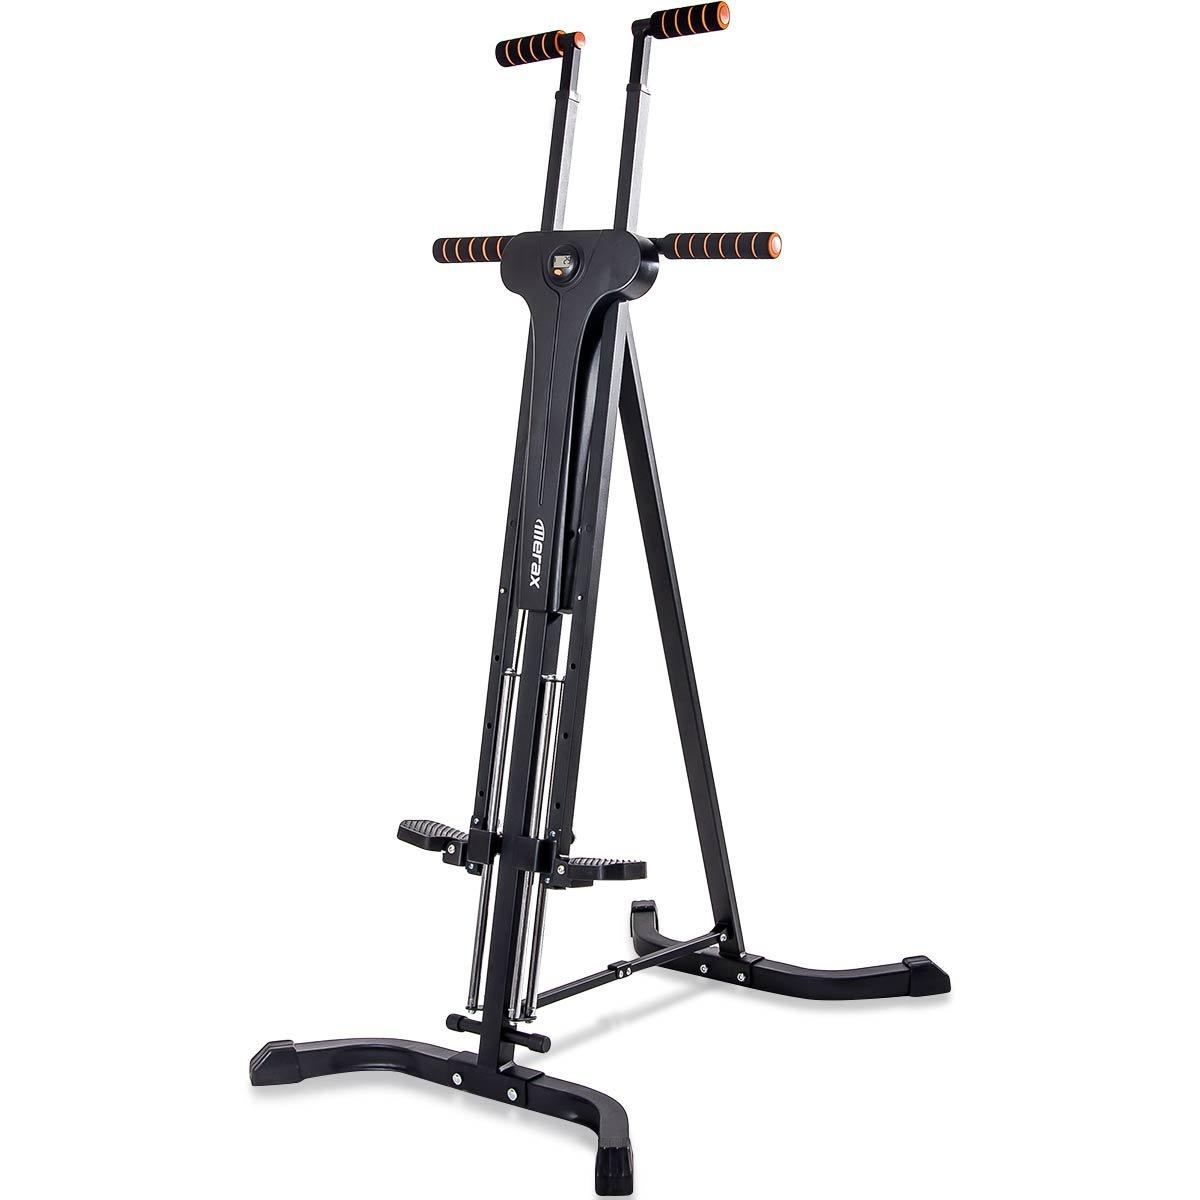 Merax Vertical Climber Fitness Climbing Cardio Machine Full Total Body Workout Fitness Folding Climber 2.0 (Black)